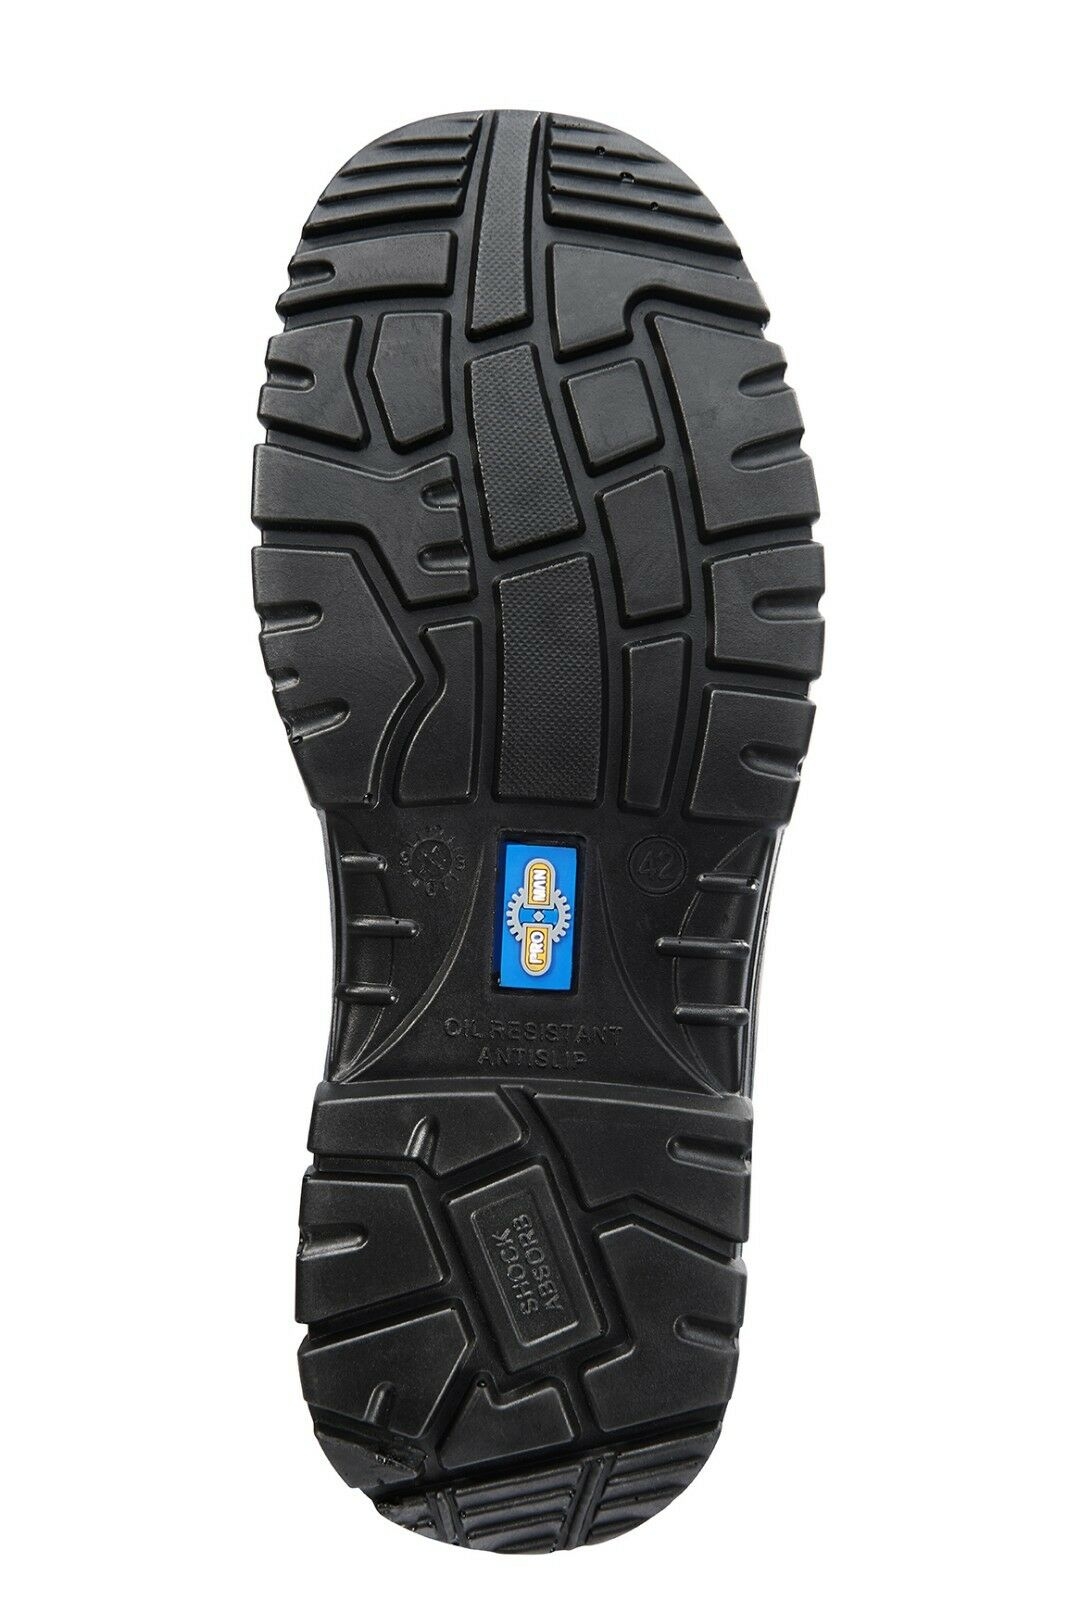 ROCK Fall Uomo Pro AUSTIN S3 nero metallo libero con punta composita